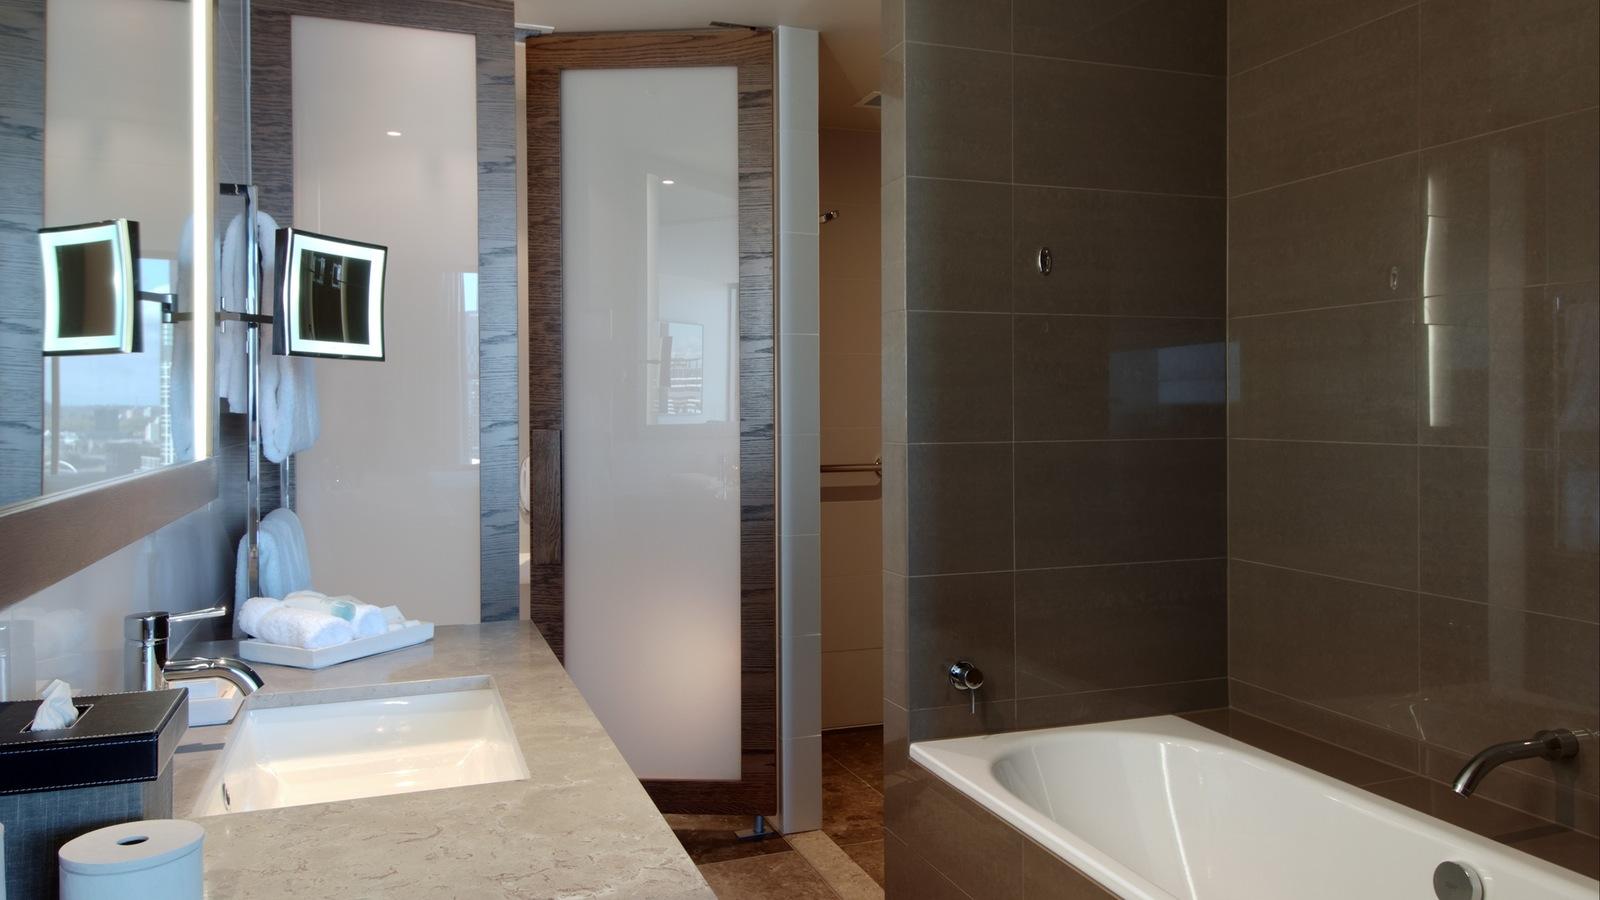 Hilton Melbourne South Wharf - Guest Room Bathroom